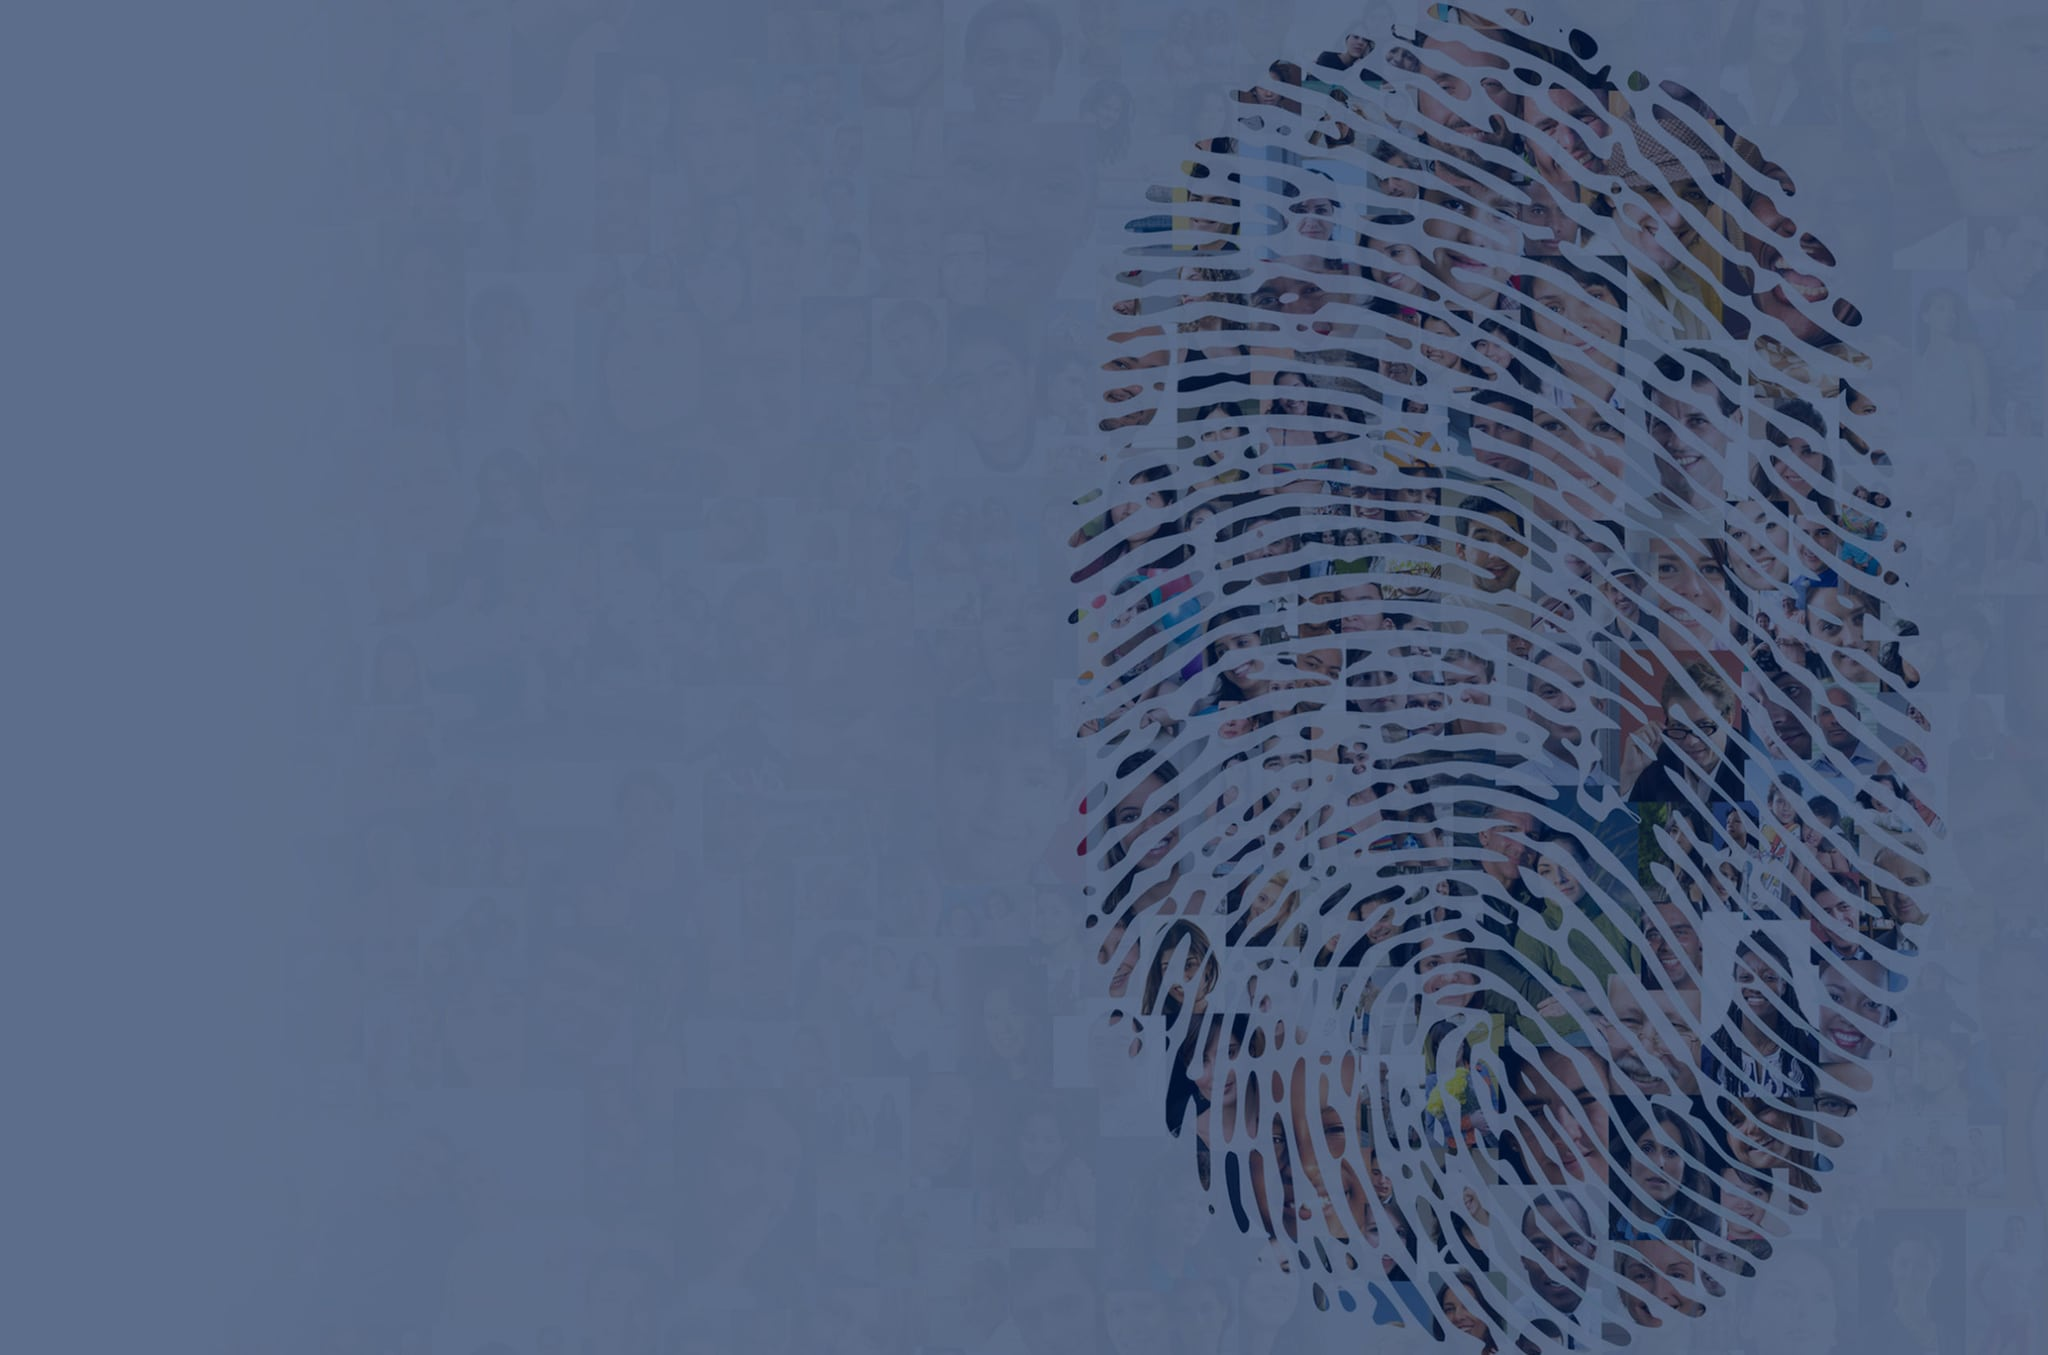 colourful thumbprint